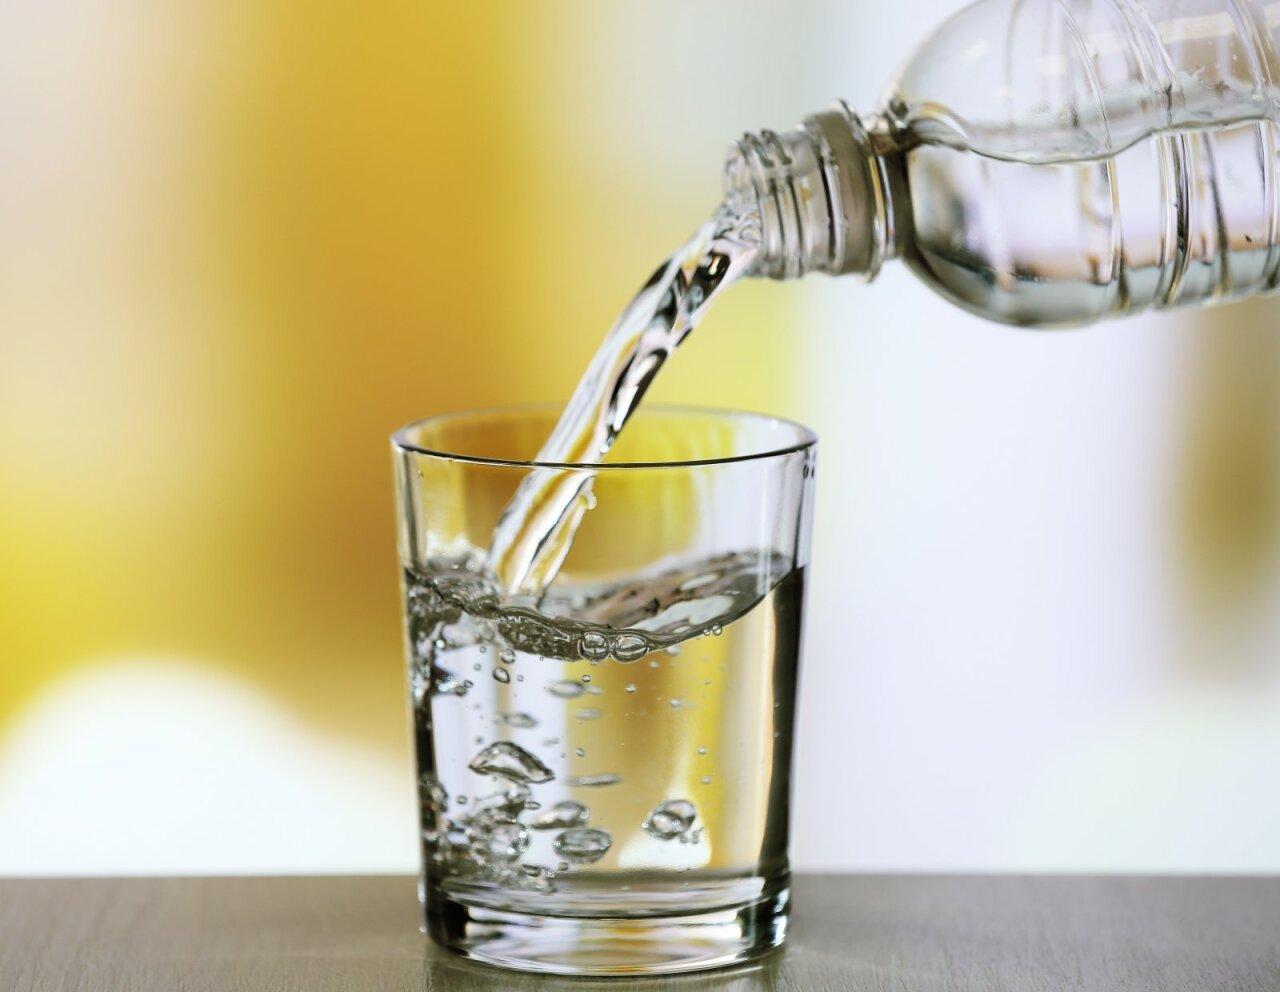 galite gerti daug vandens su hipertenzija